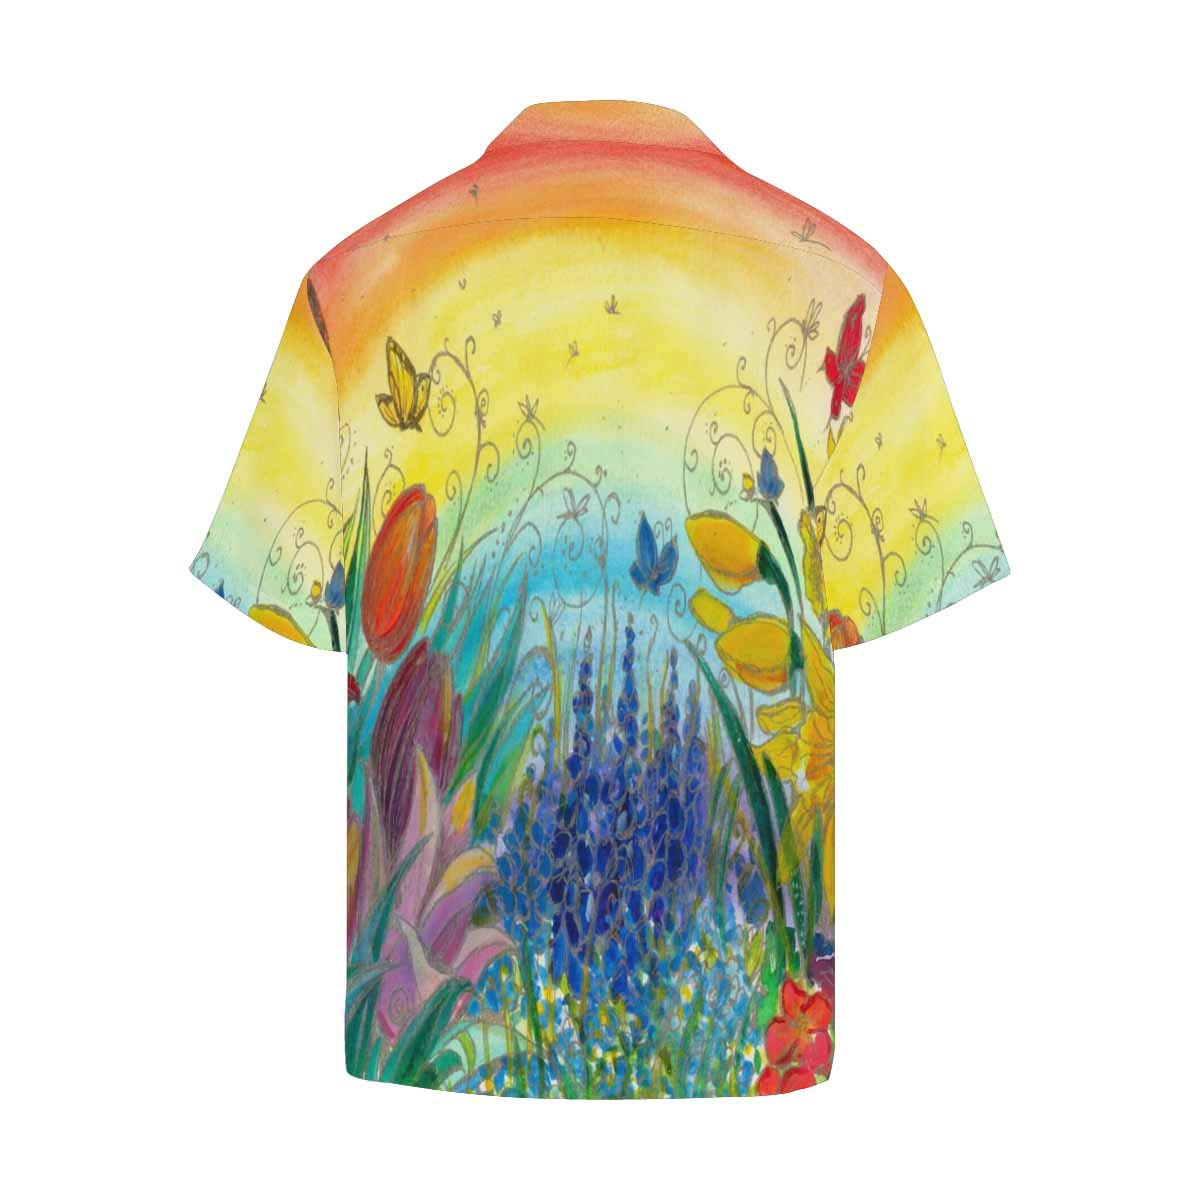 InterestPrint Spring Flower and Rainbow Clothing Summer Clothes Short Sleeve Shirt